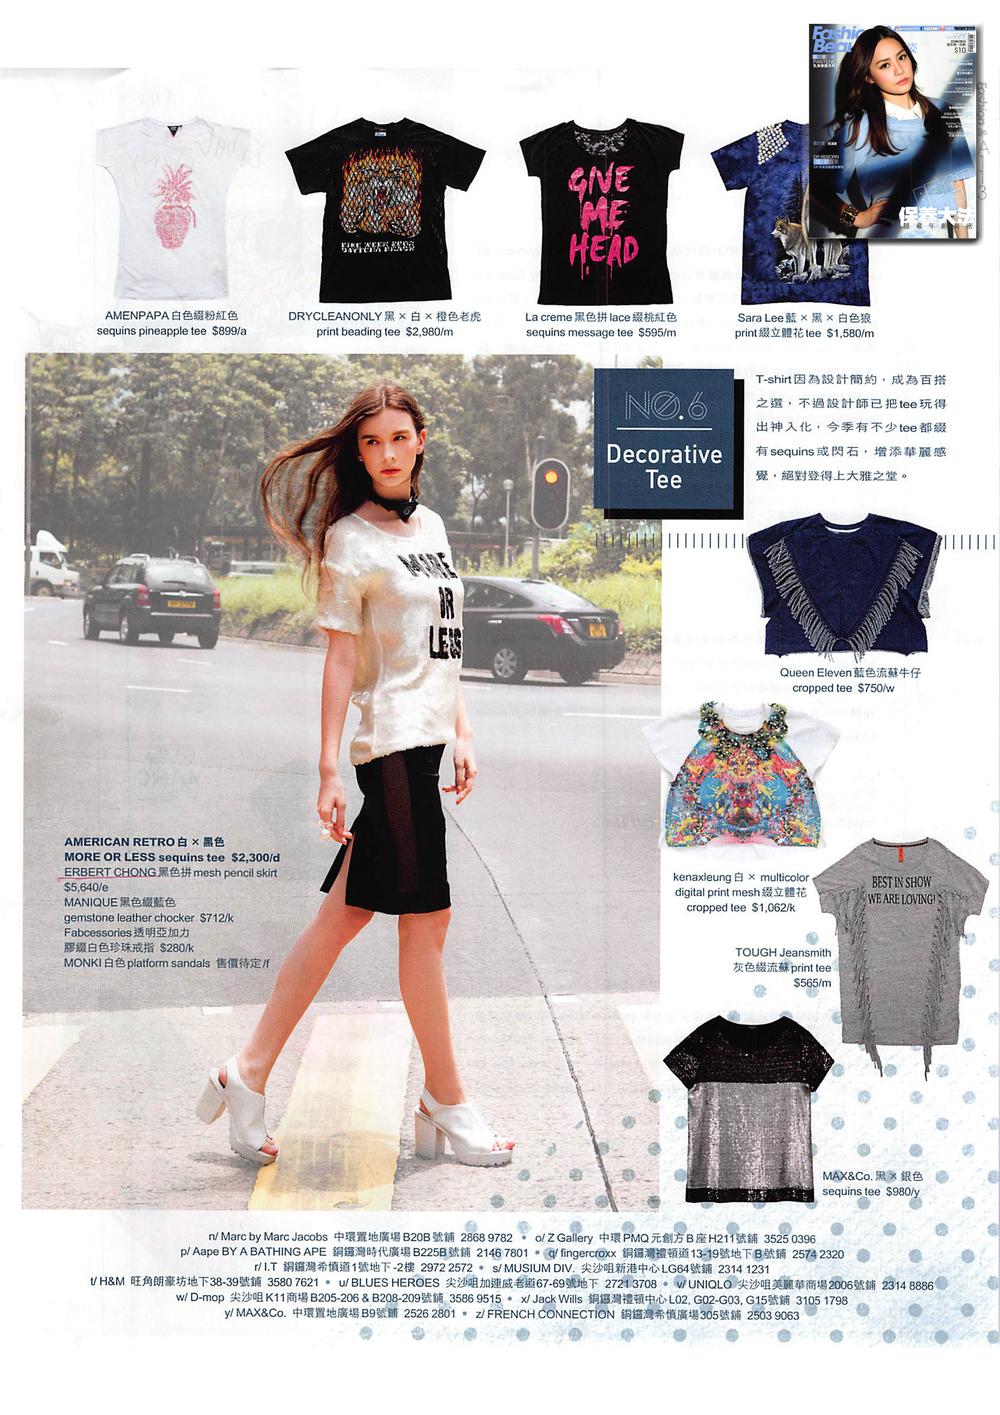 FashionBeautyJUNE2014.jpg